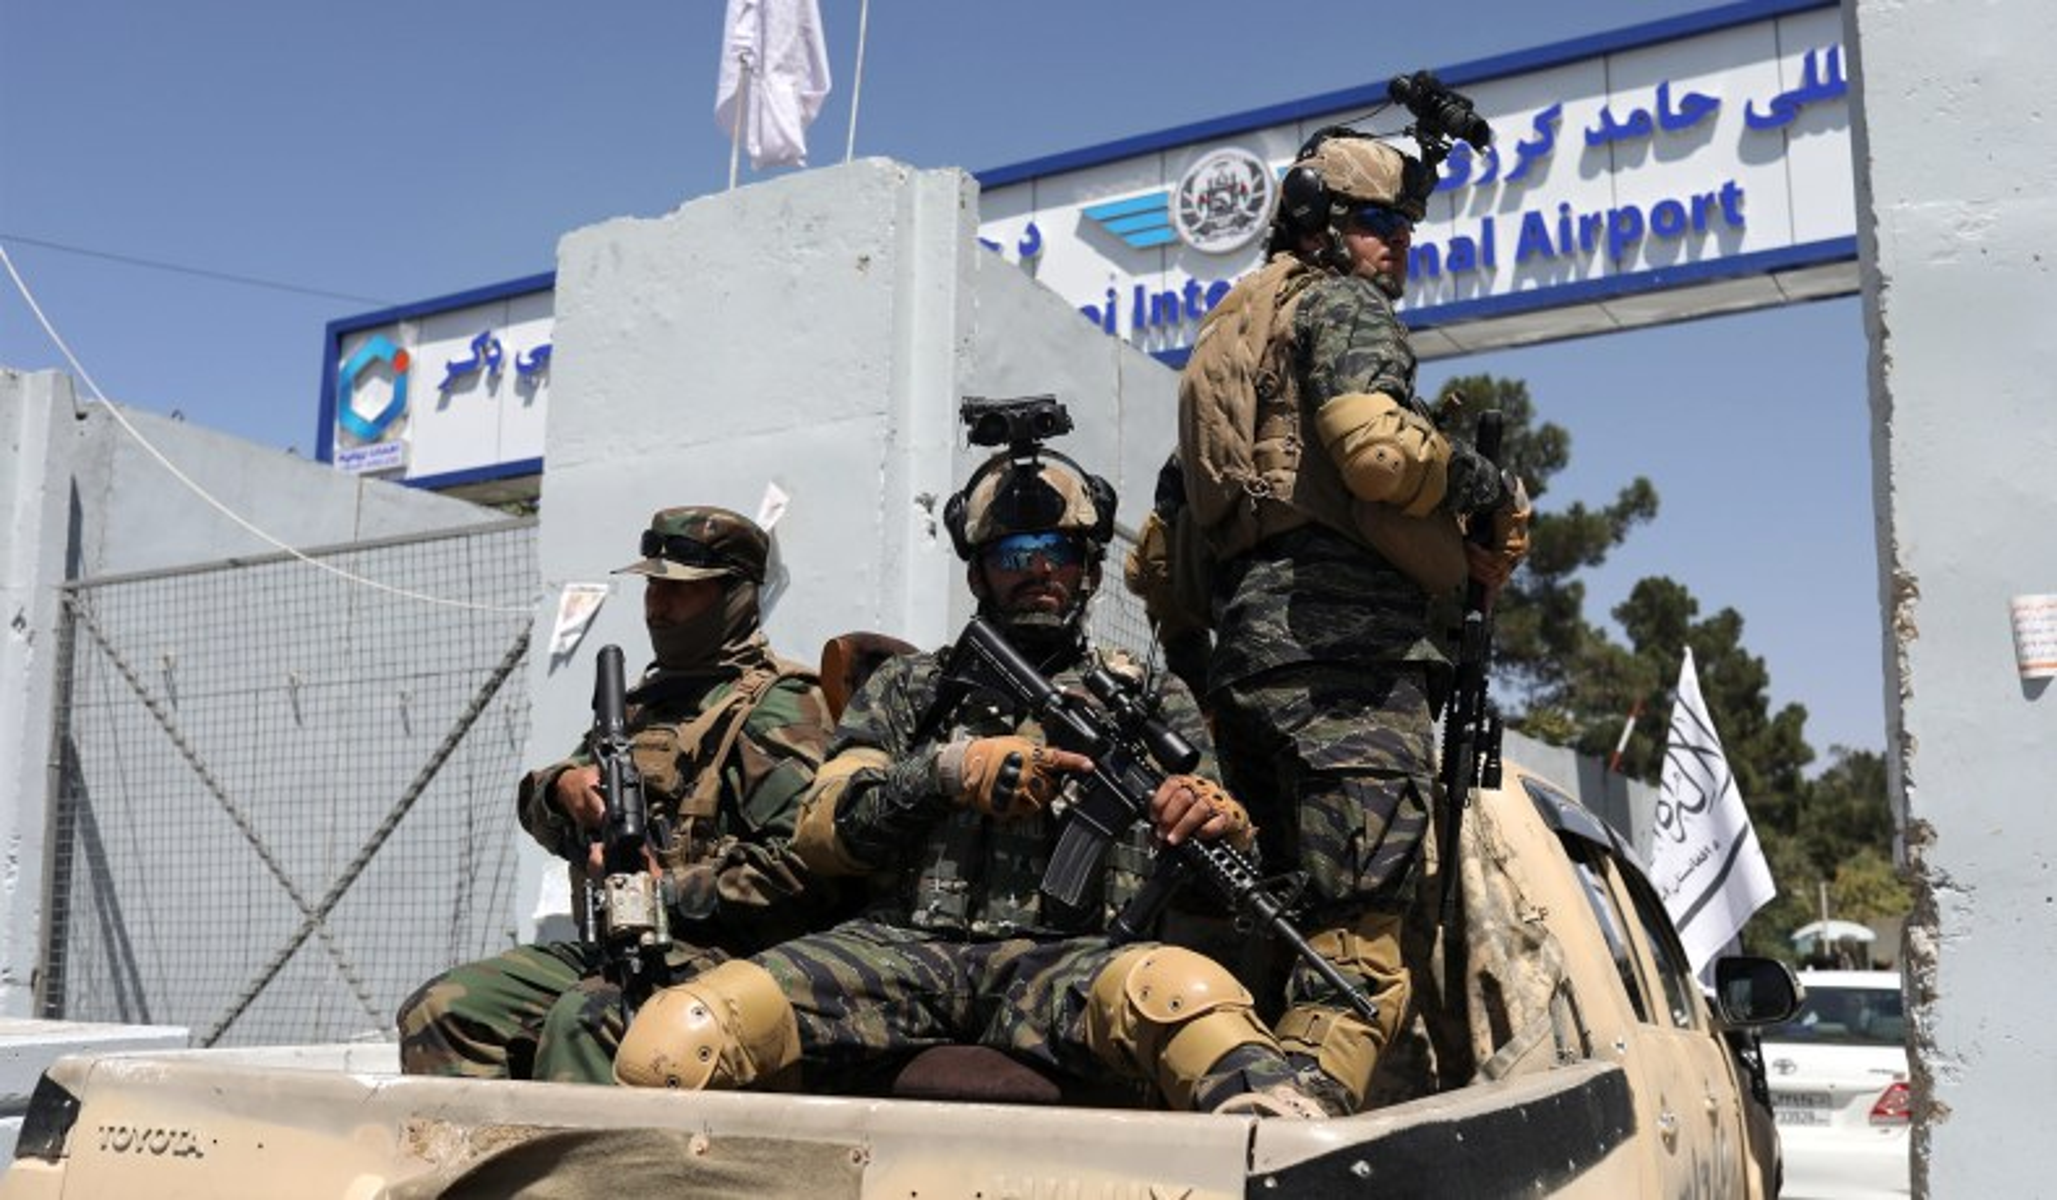 talibanairport